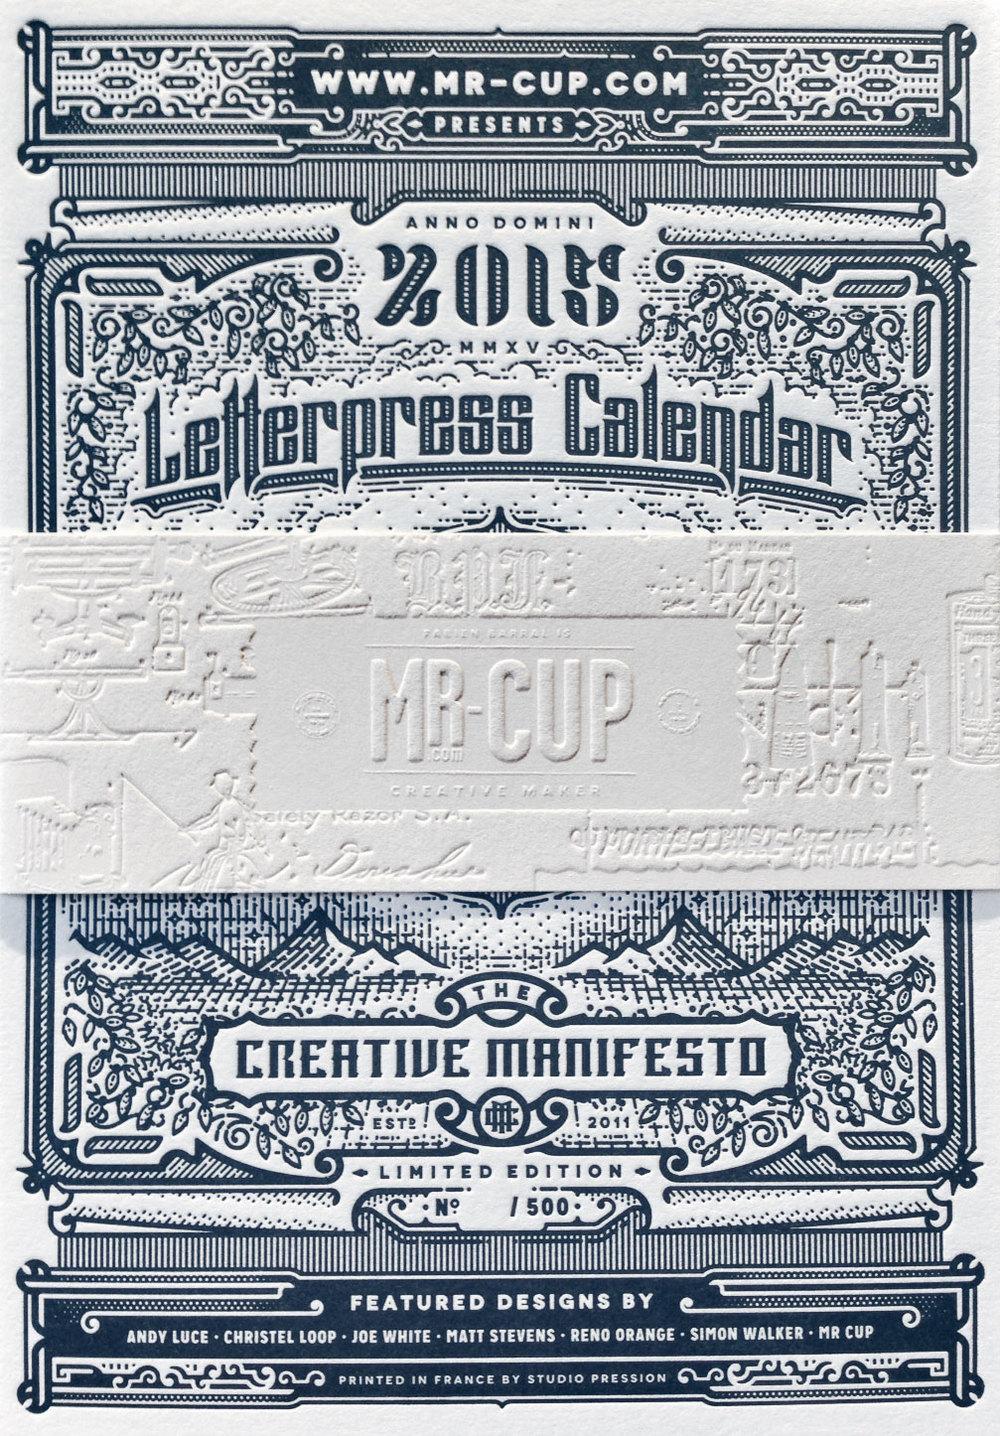 letterpress-calendar2015-mrcup1